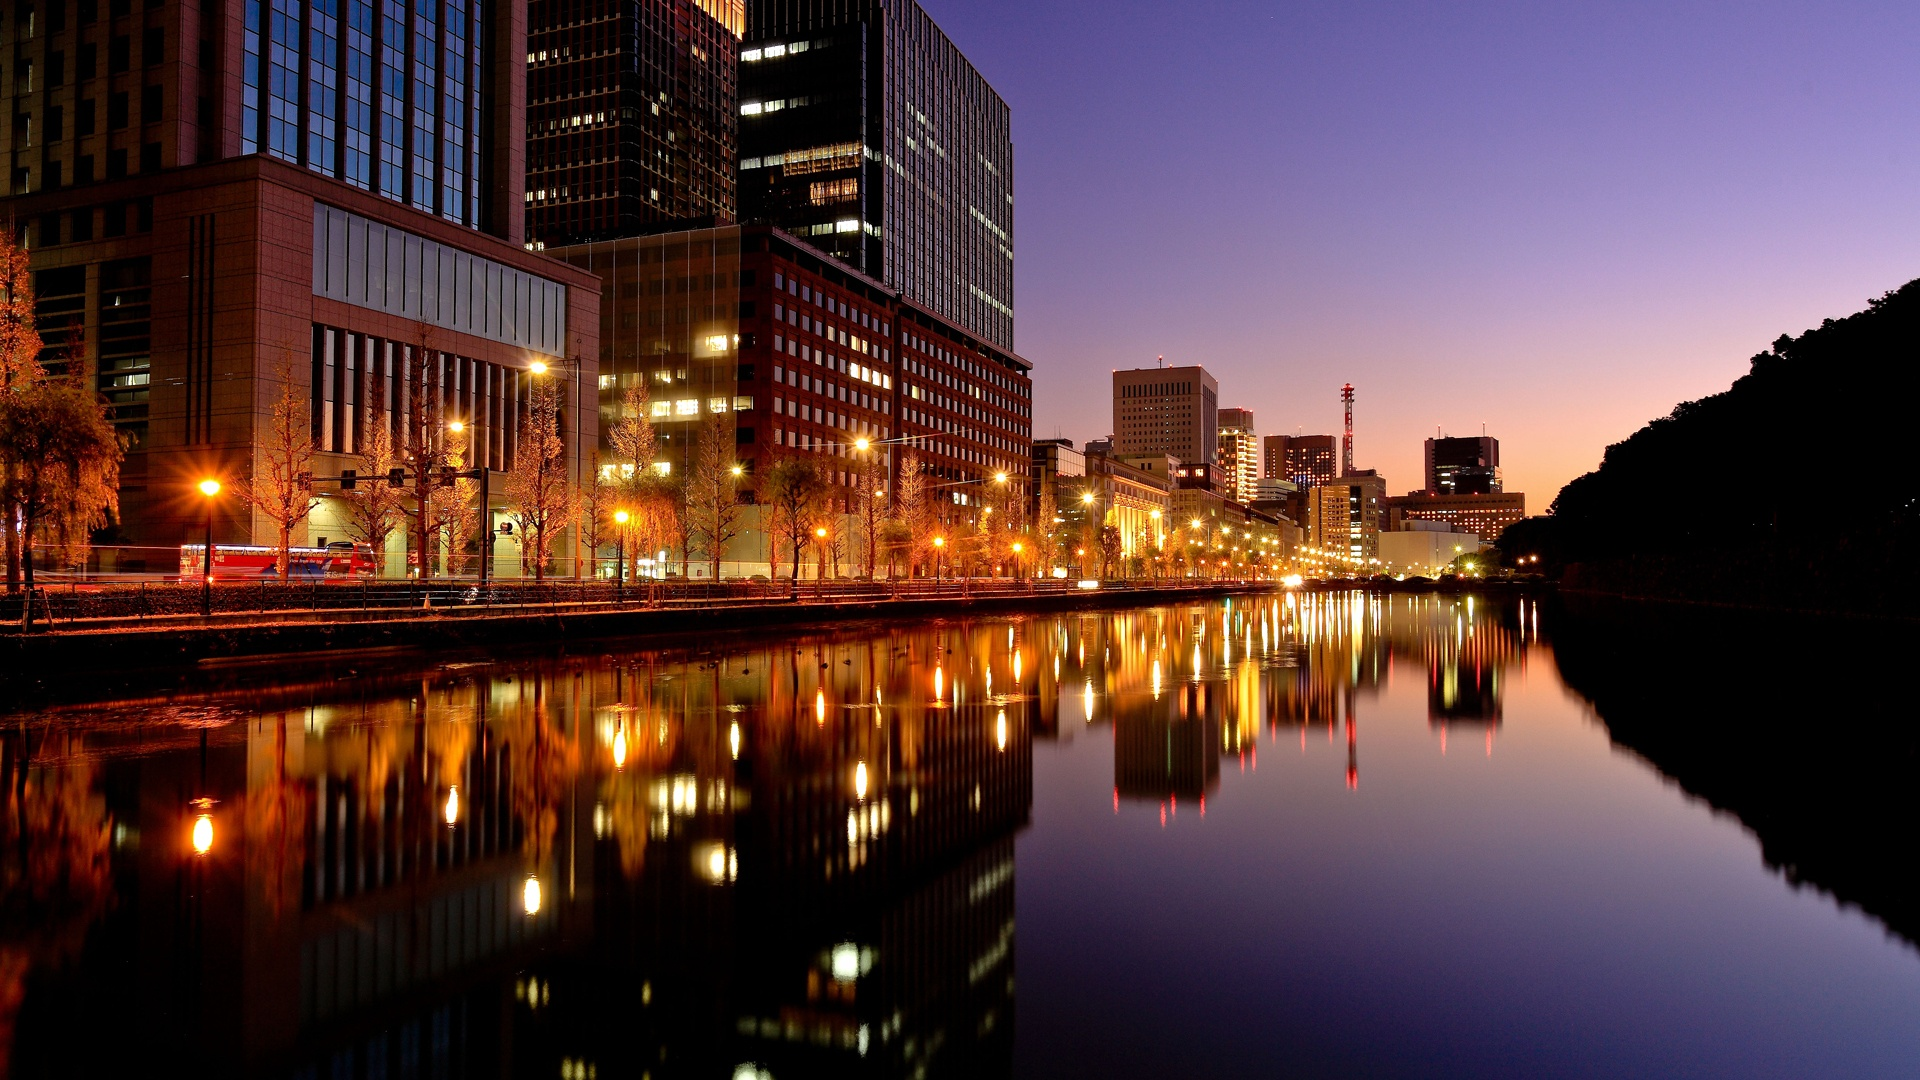 Tokyo City Night Lights Wallpapers   1920x1080   716904 1920x1080